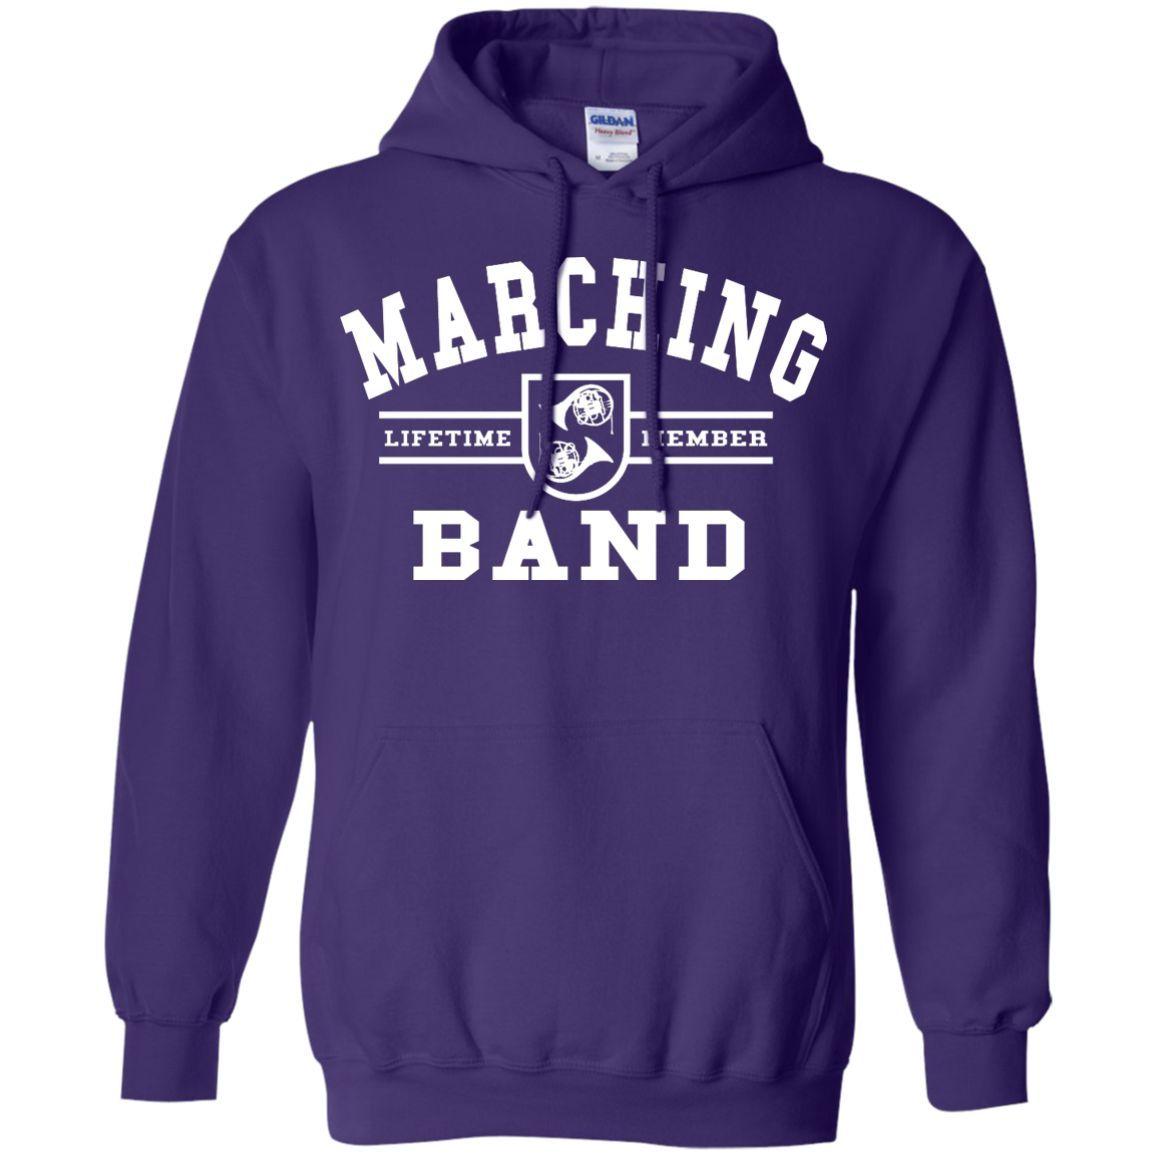 Marching Band Horn Custom Hoodie